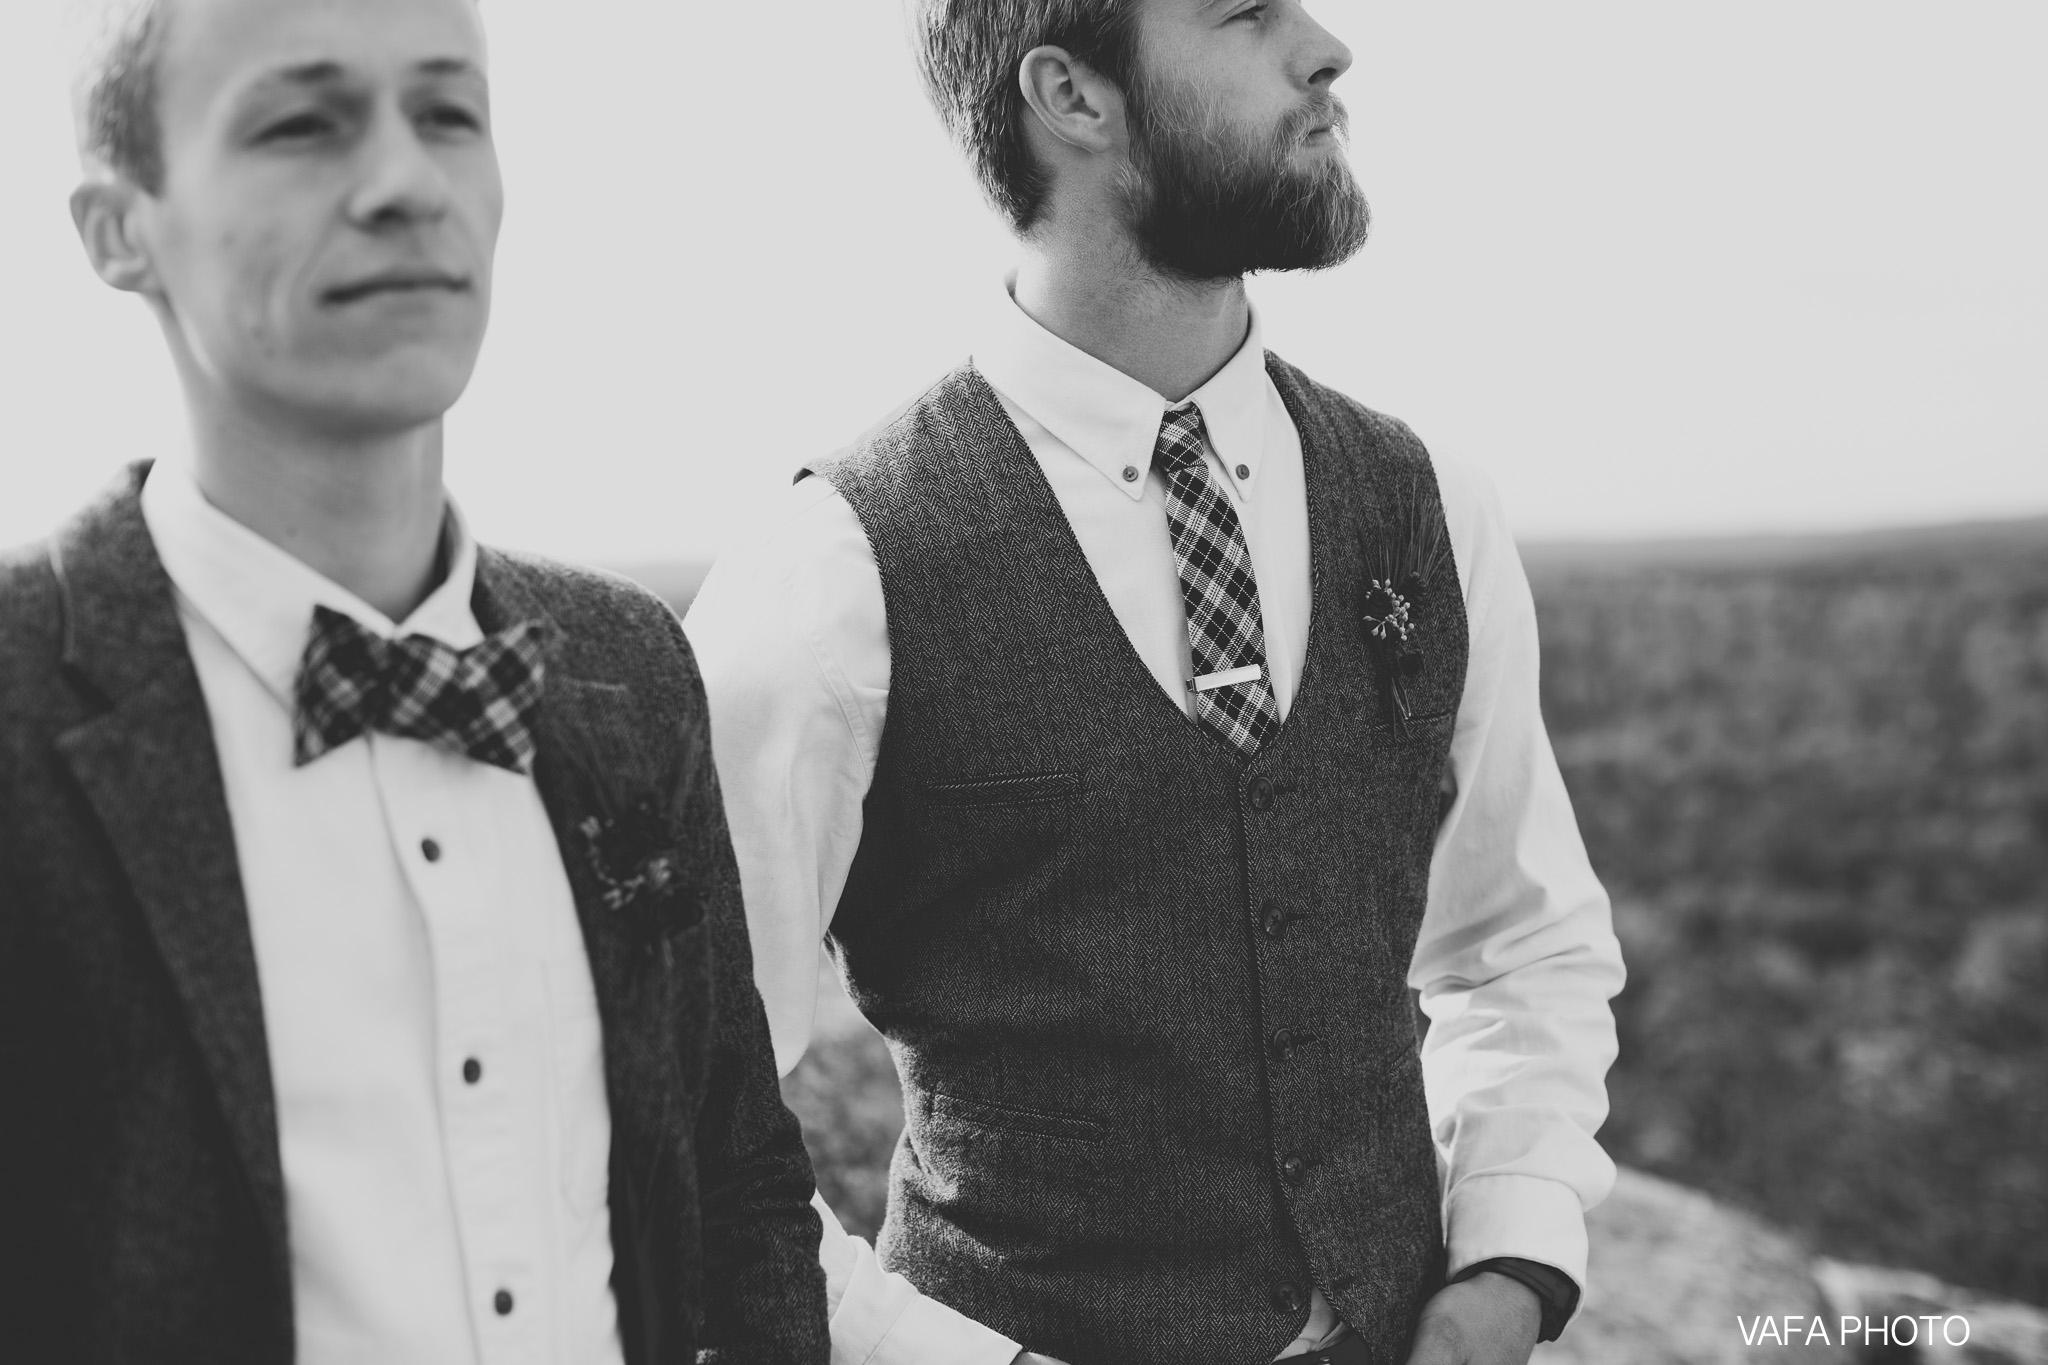 Hogback-Mountain-Wedding-Chelsea-Josh-Vafa-Photo-342.jpg